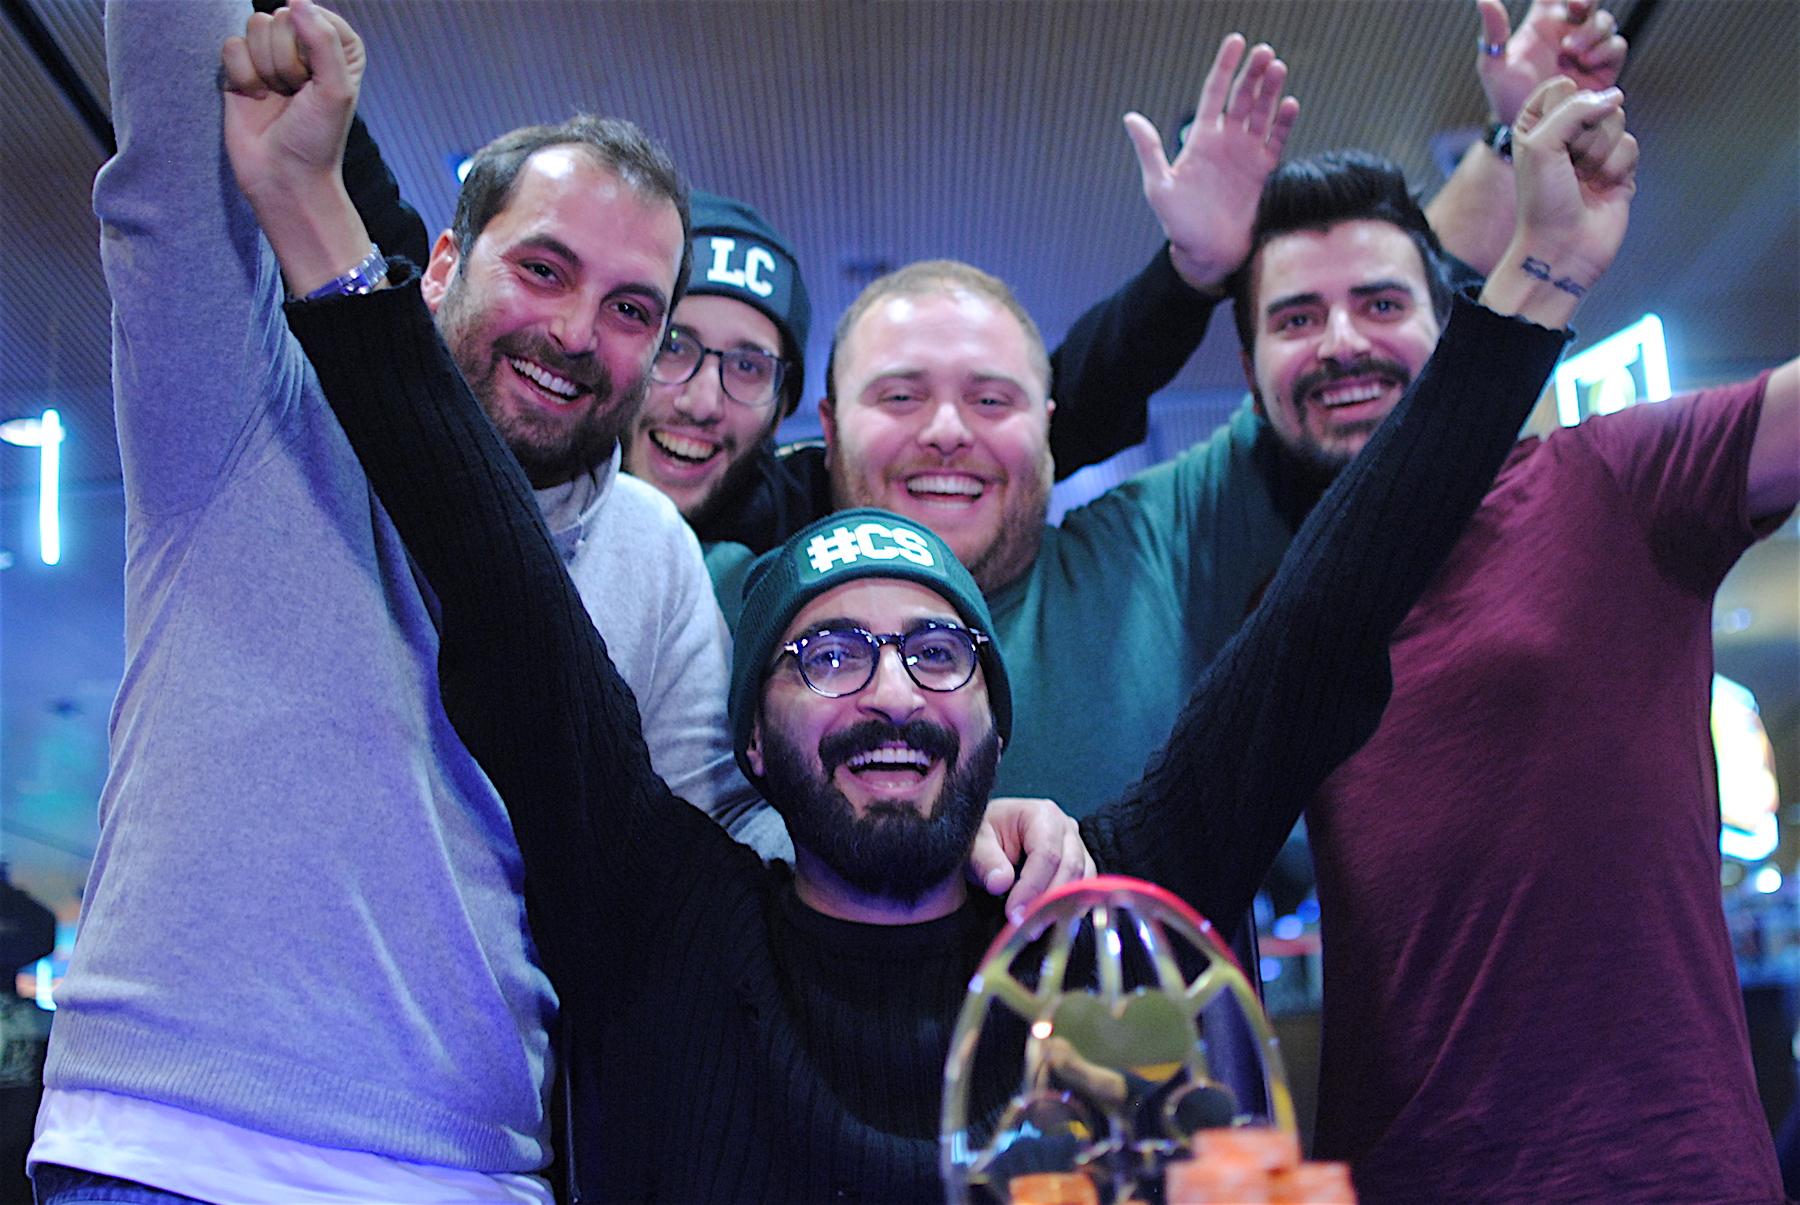 Savinelli vince il trentesimo PPTour e contribuisce al 'Chain for Amatrice'